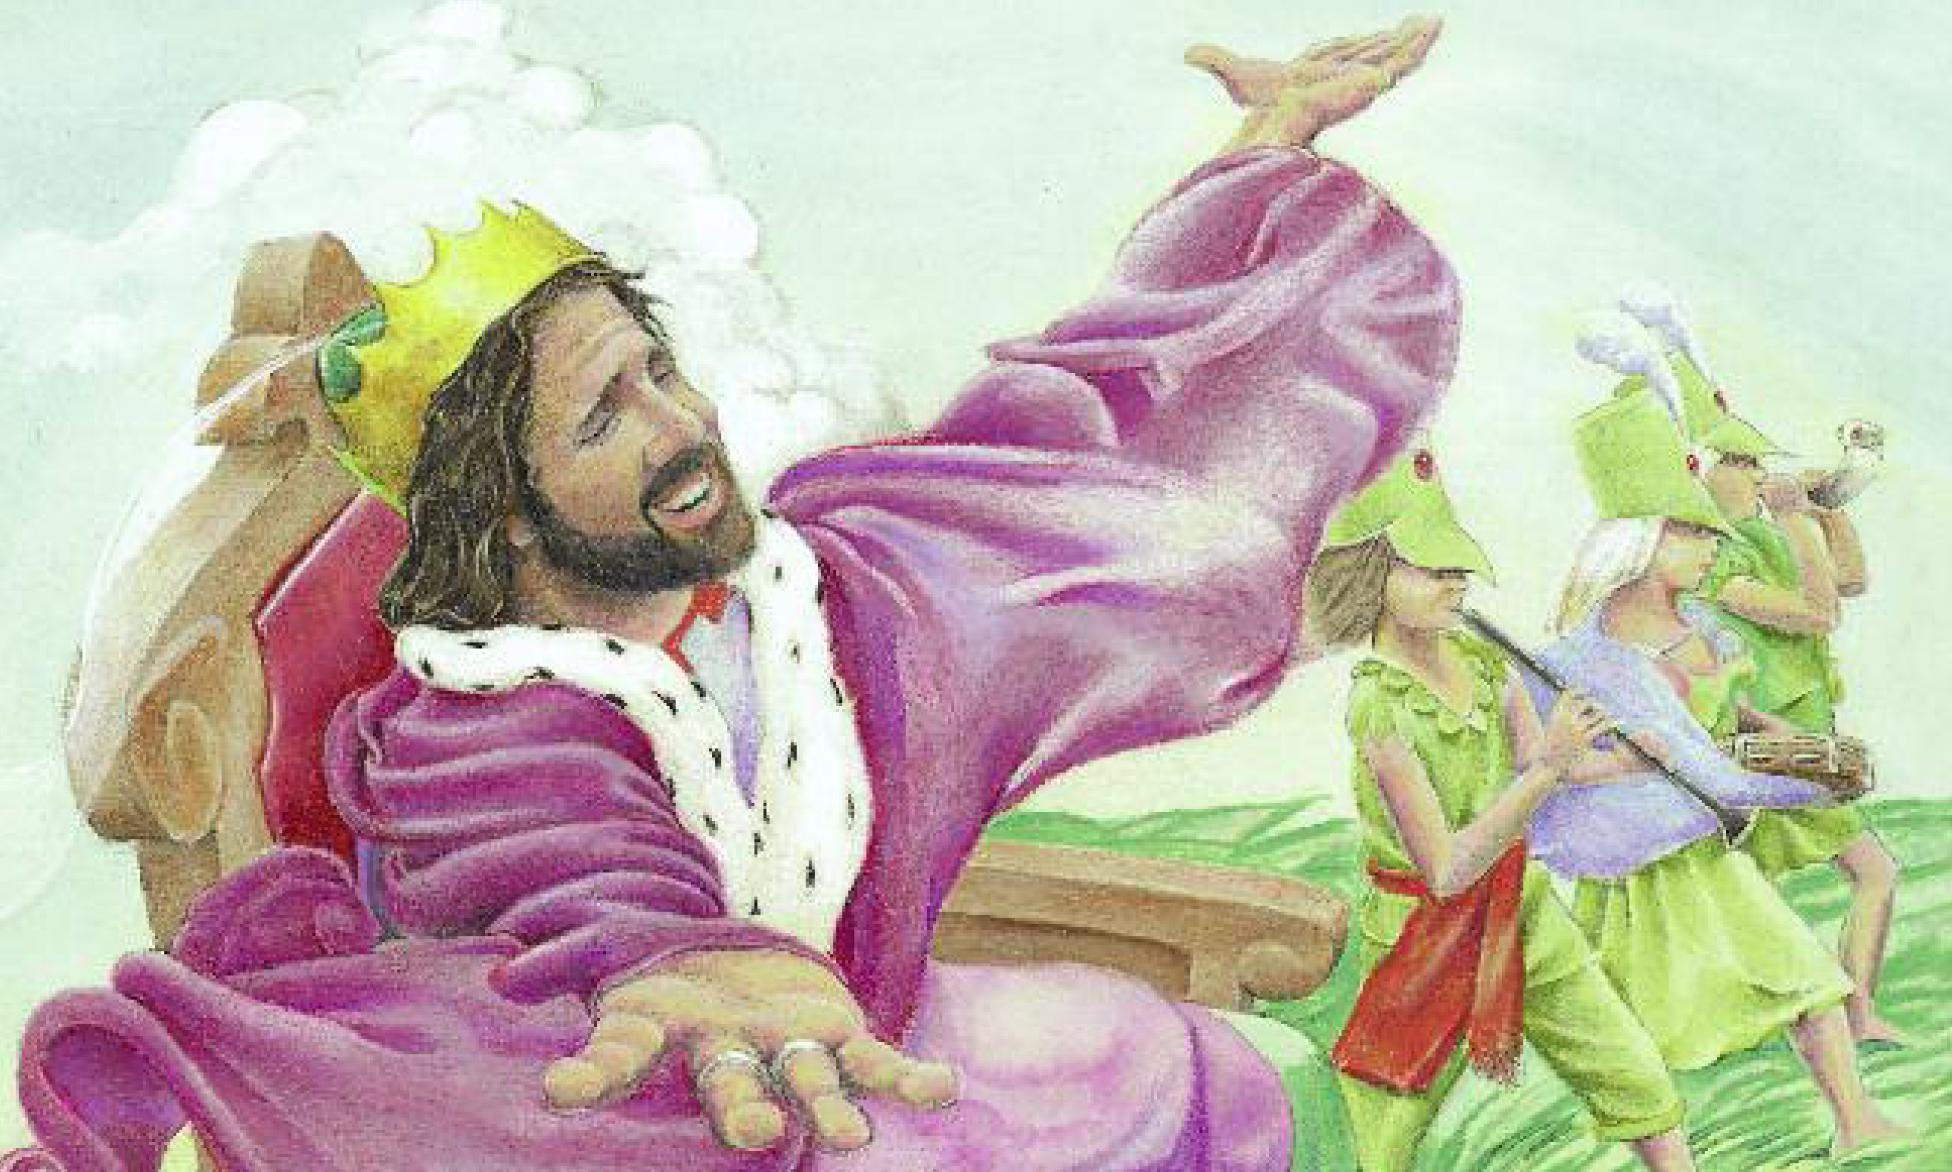 King of Spring Illustration